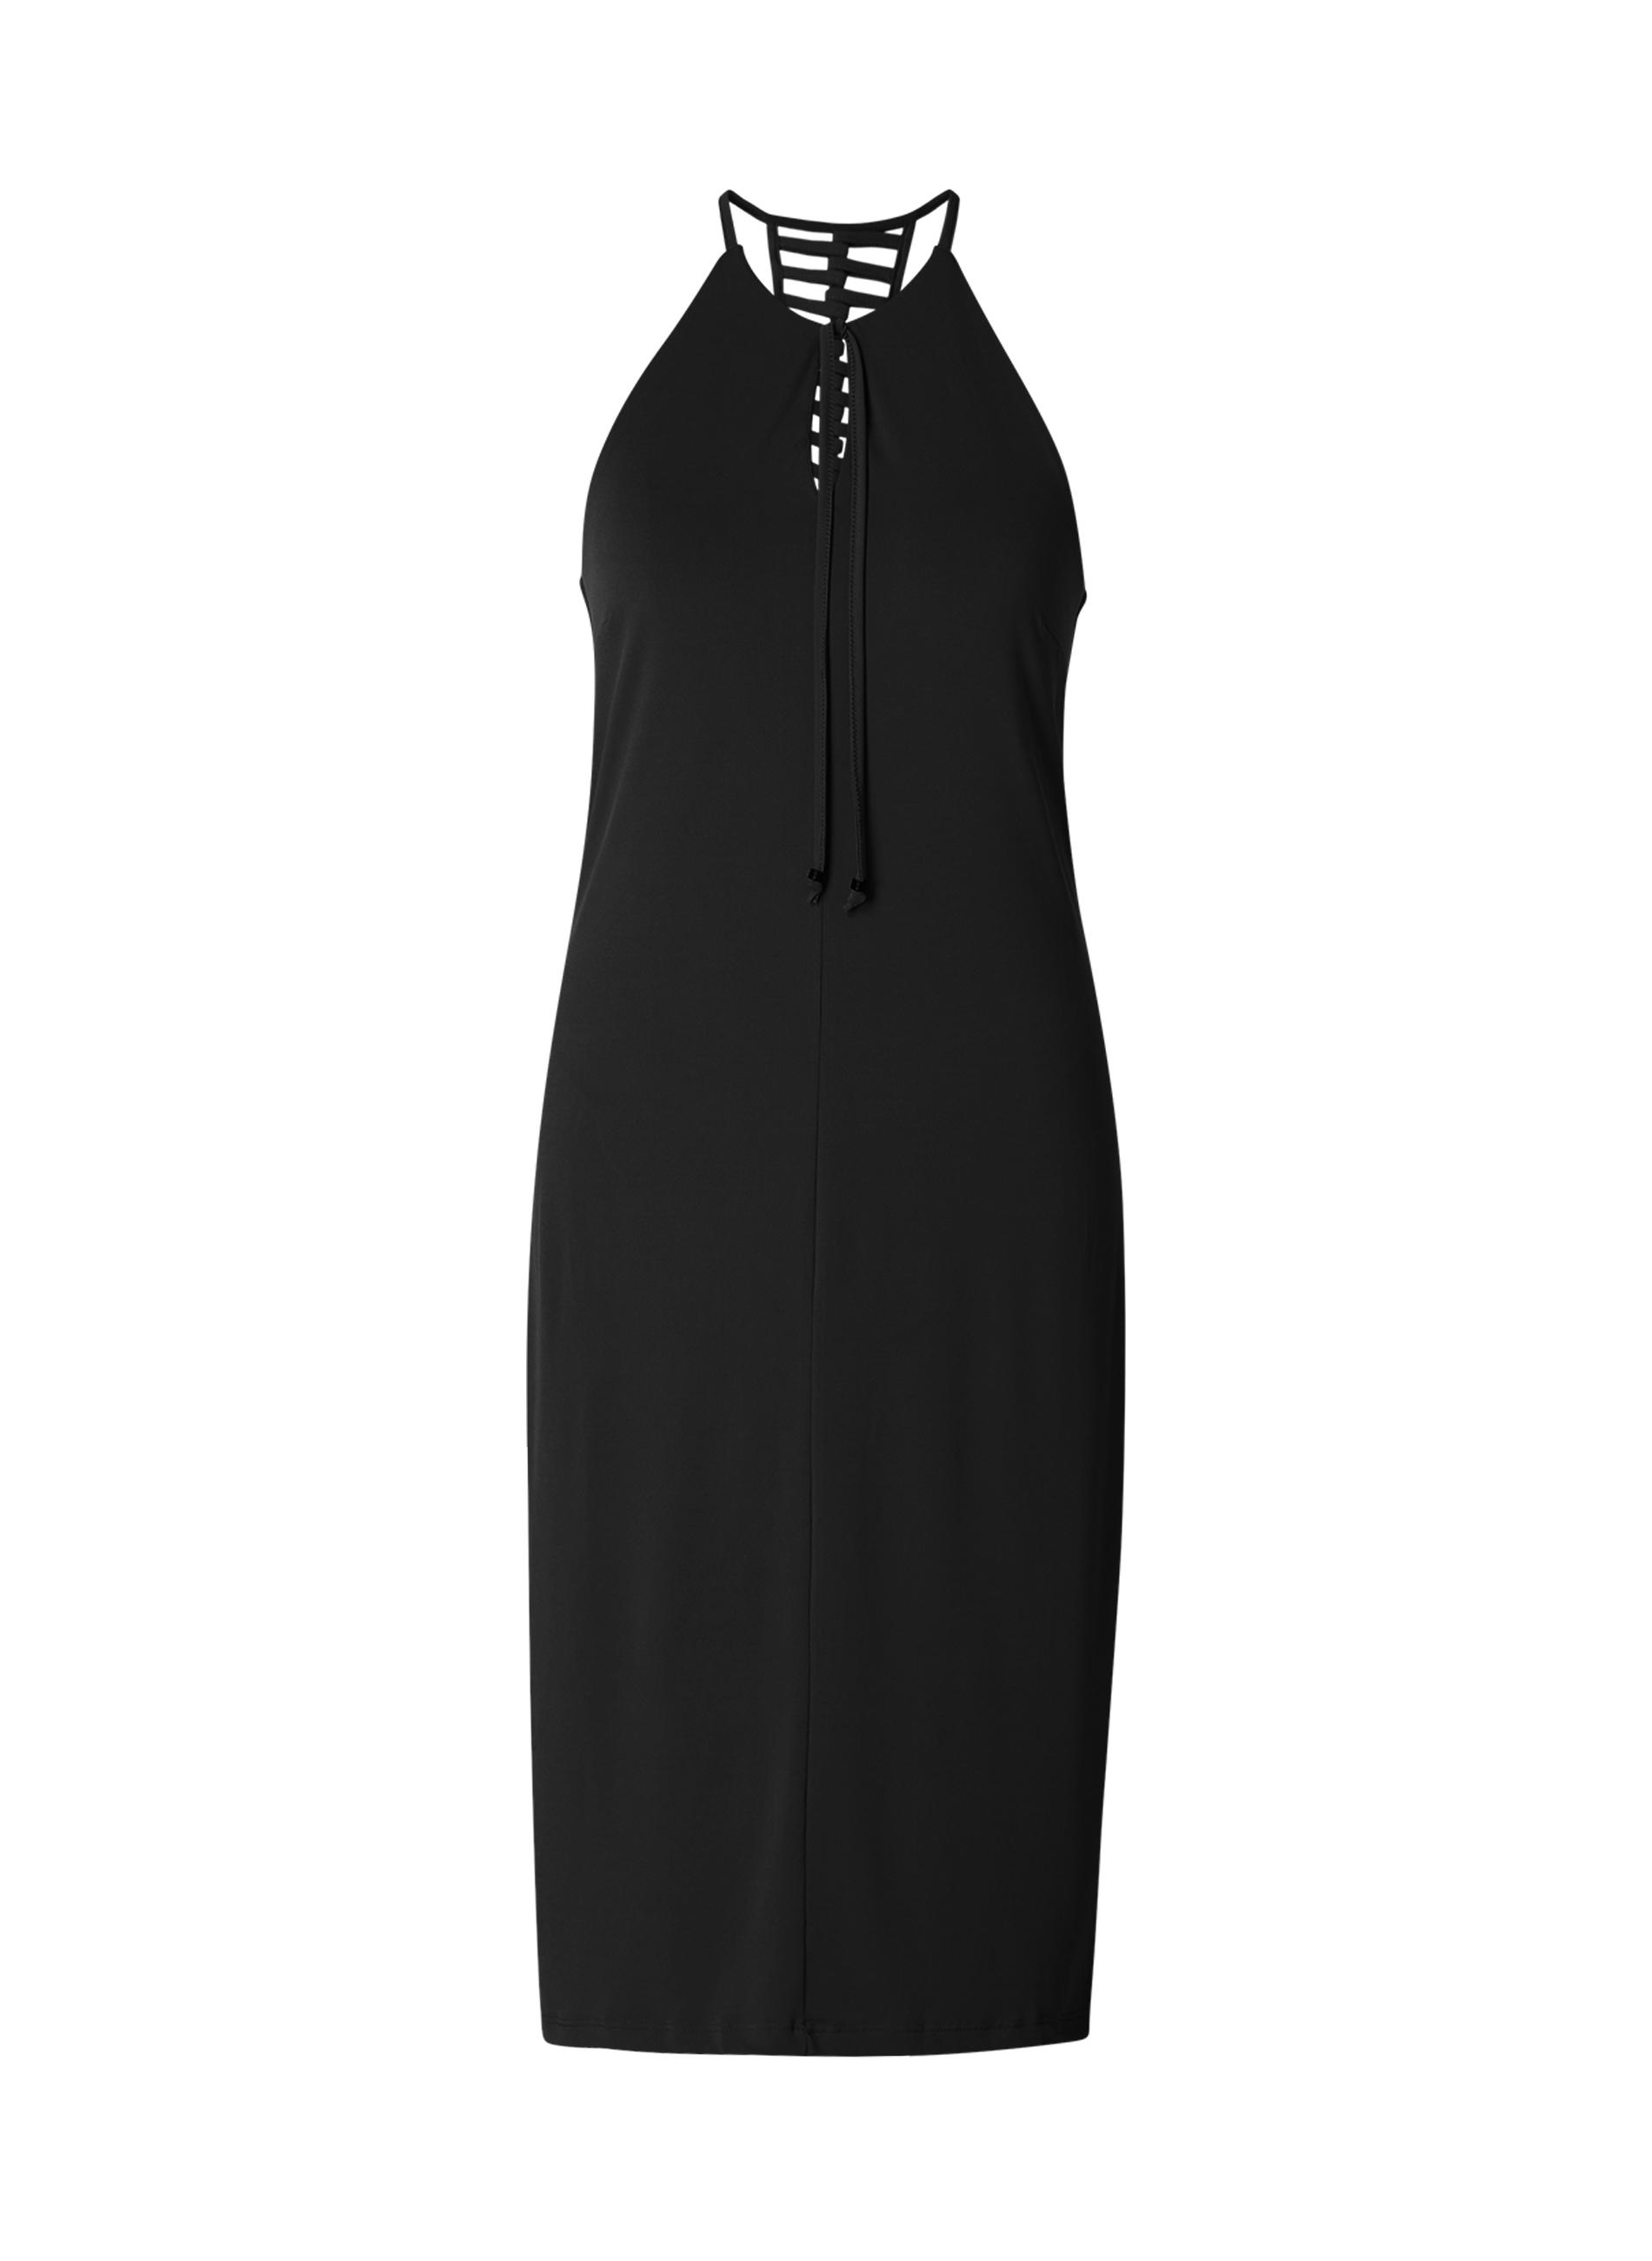 Yest jurk Kyla 105 cm